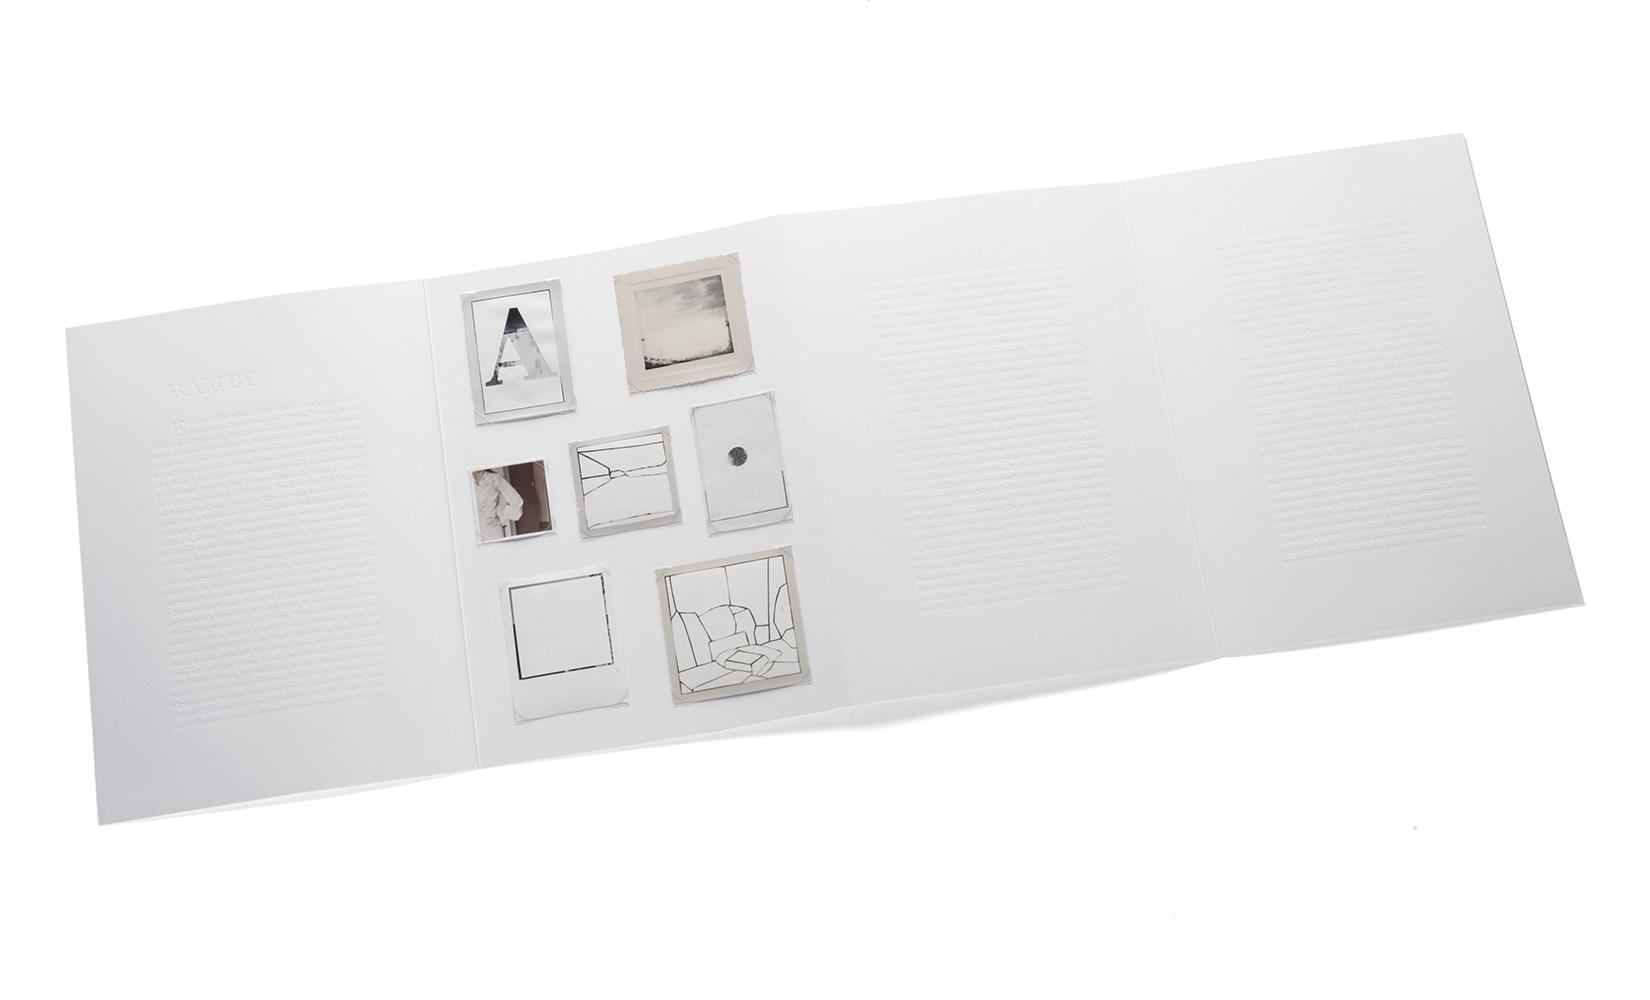 Johanna-Calle-Dibujos-04.jpg